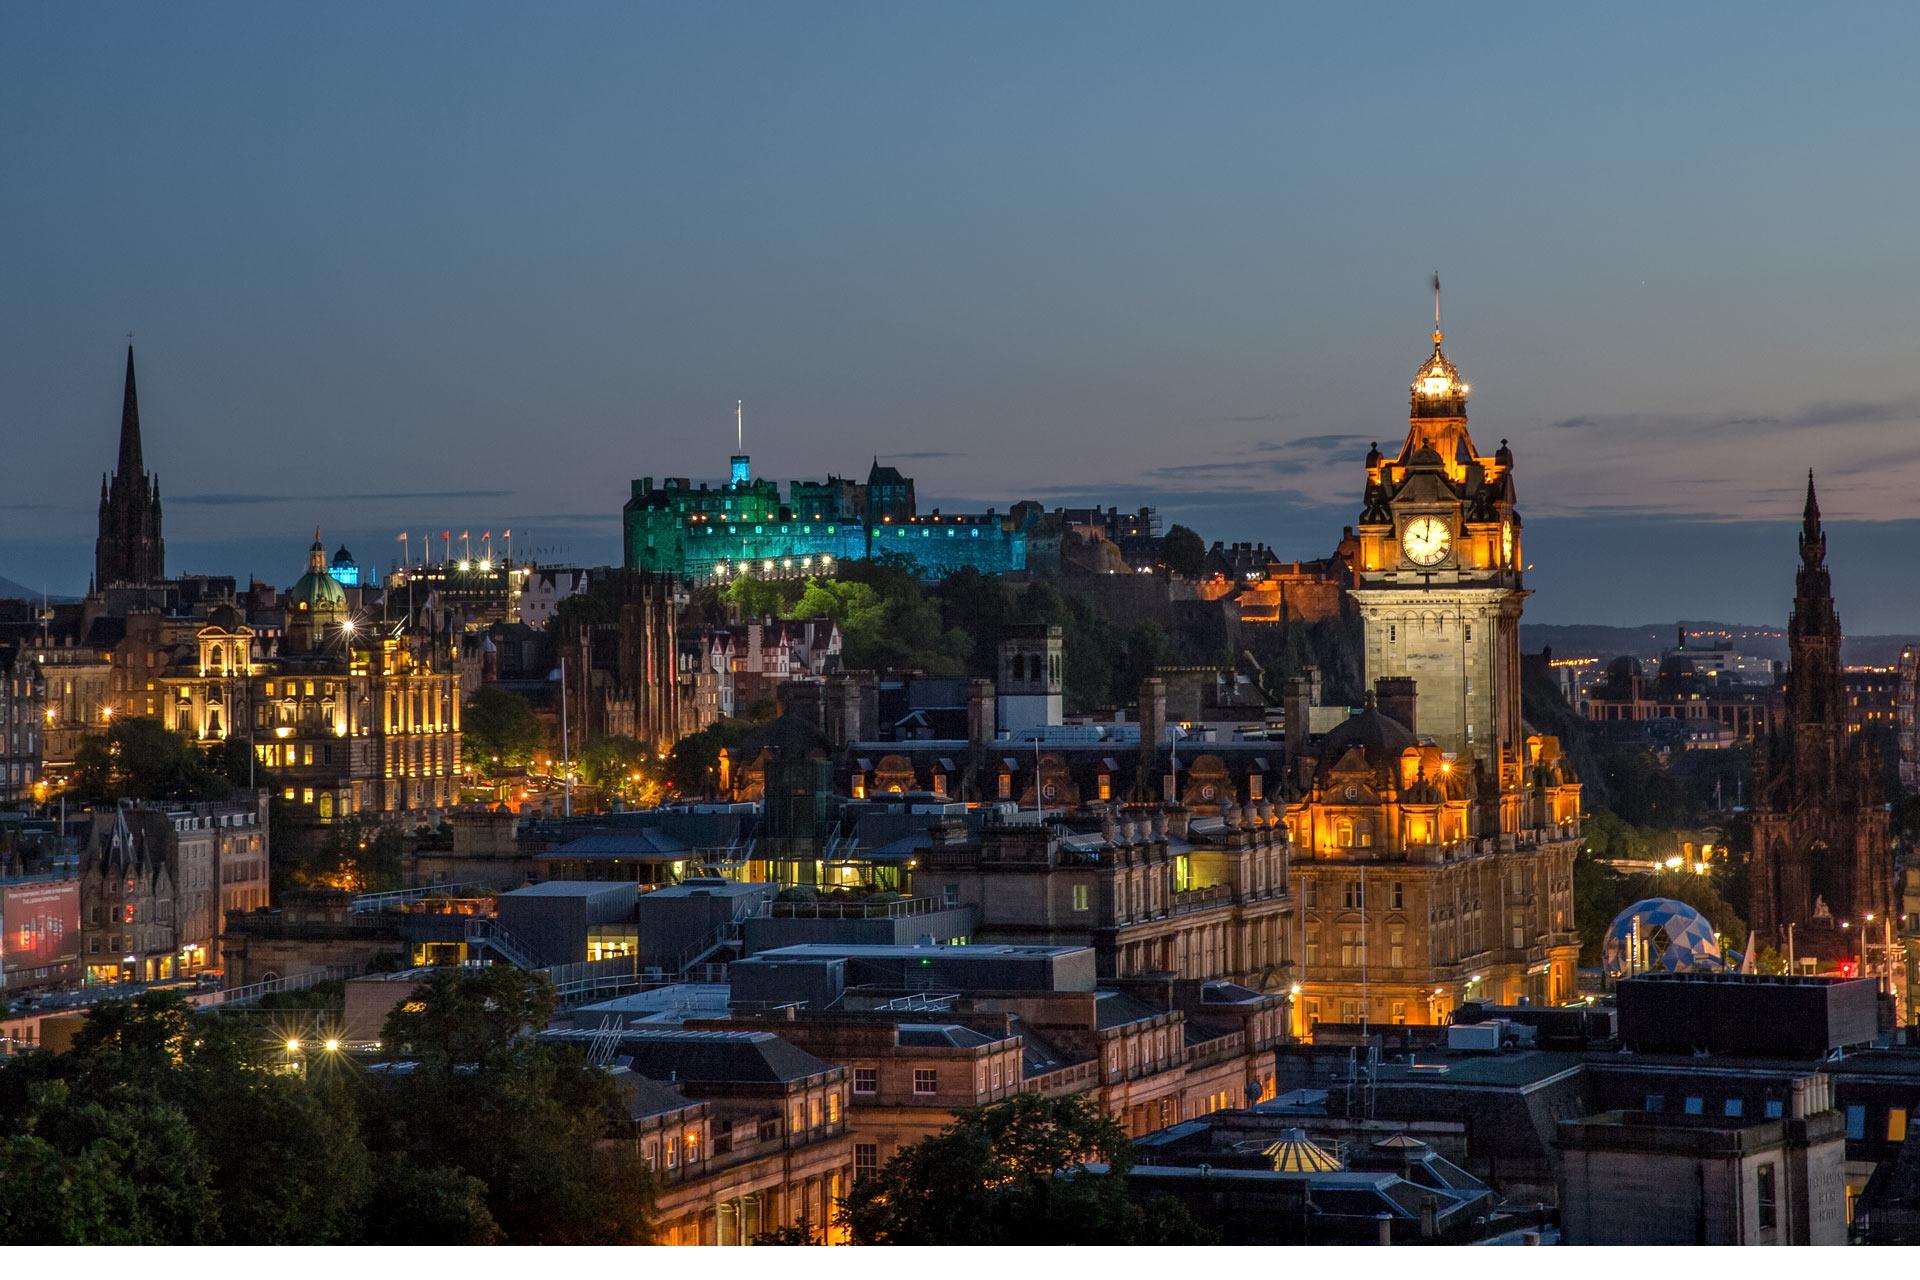 Wedding  >> 2 Days in Edinburgh - Weekend Itinerary | VisitScotland